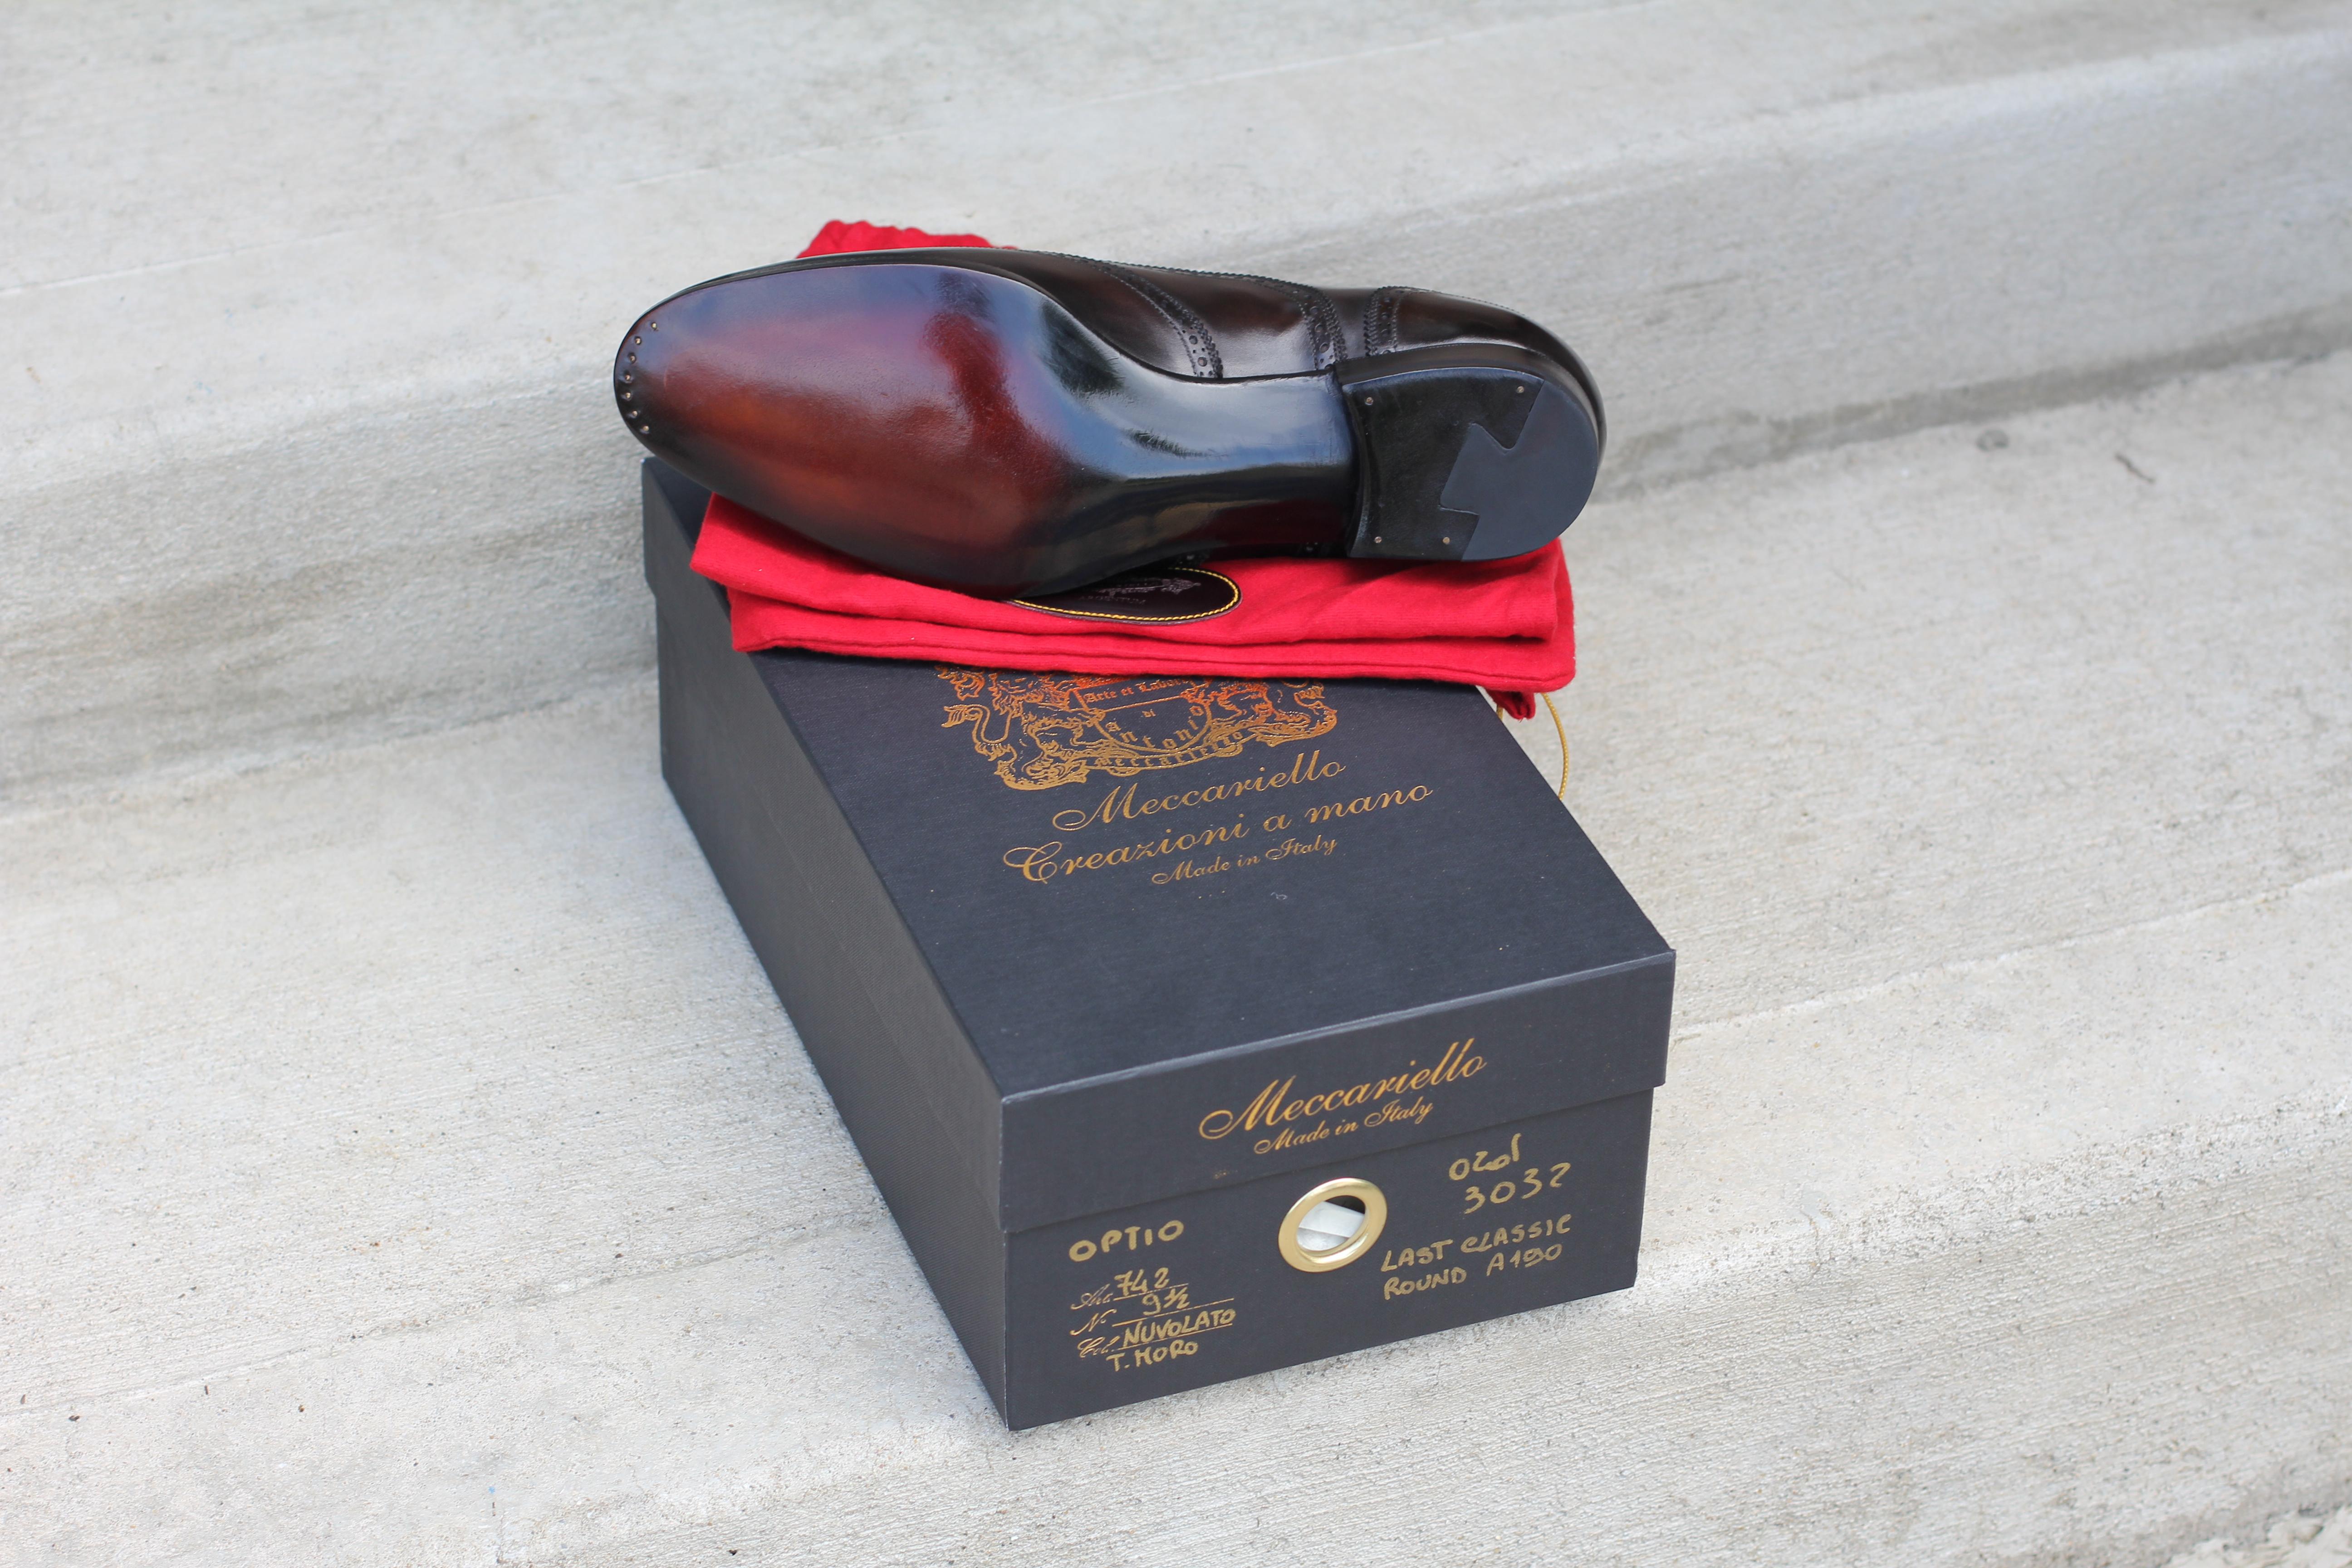 Shouldaville's photos in Antonio Meccariello Shoes